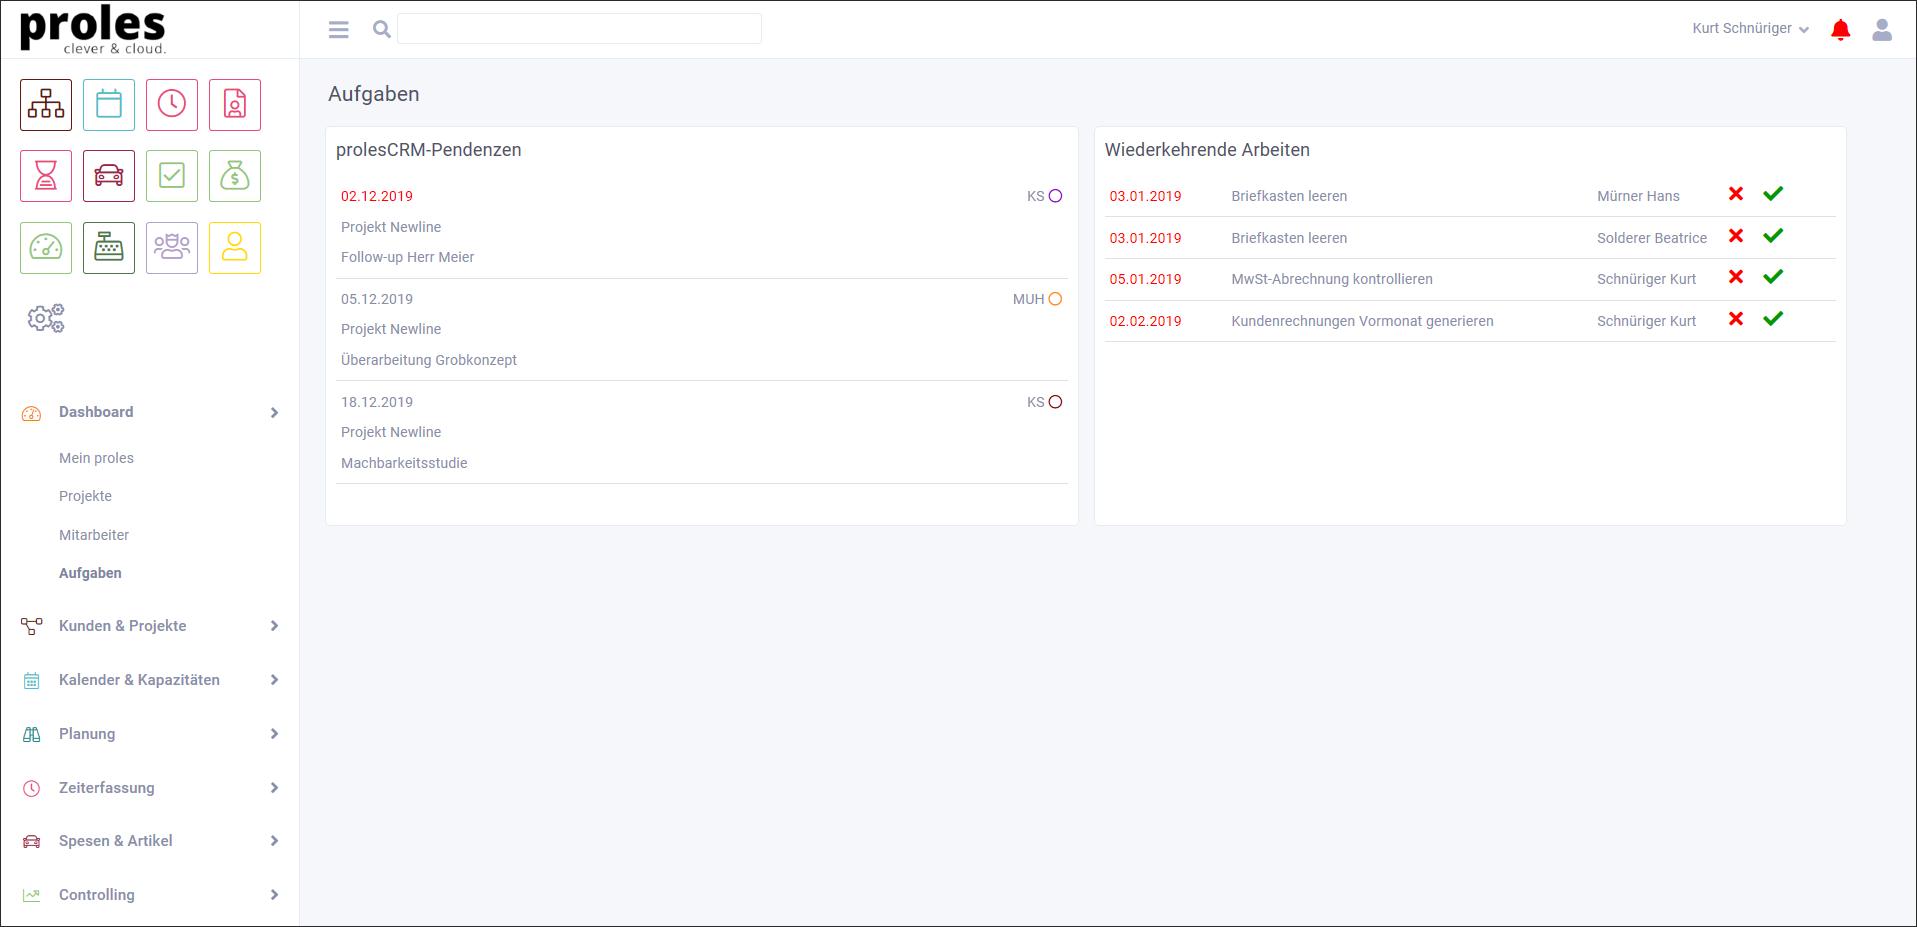 proles - Release 4 - Dashboard - Aufgaben